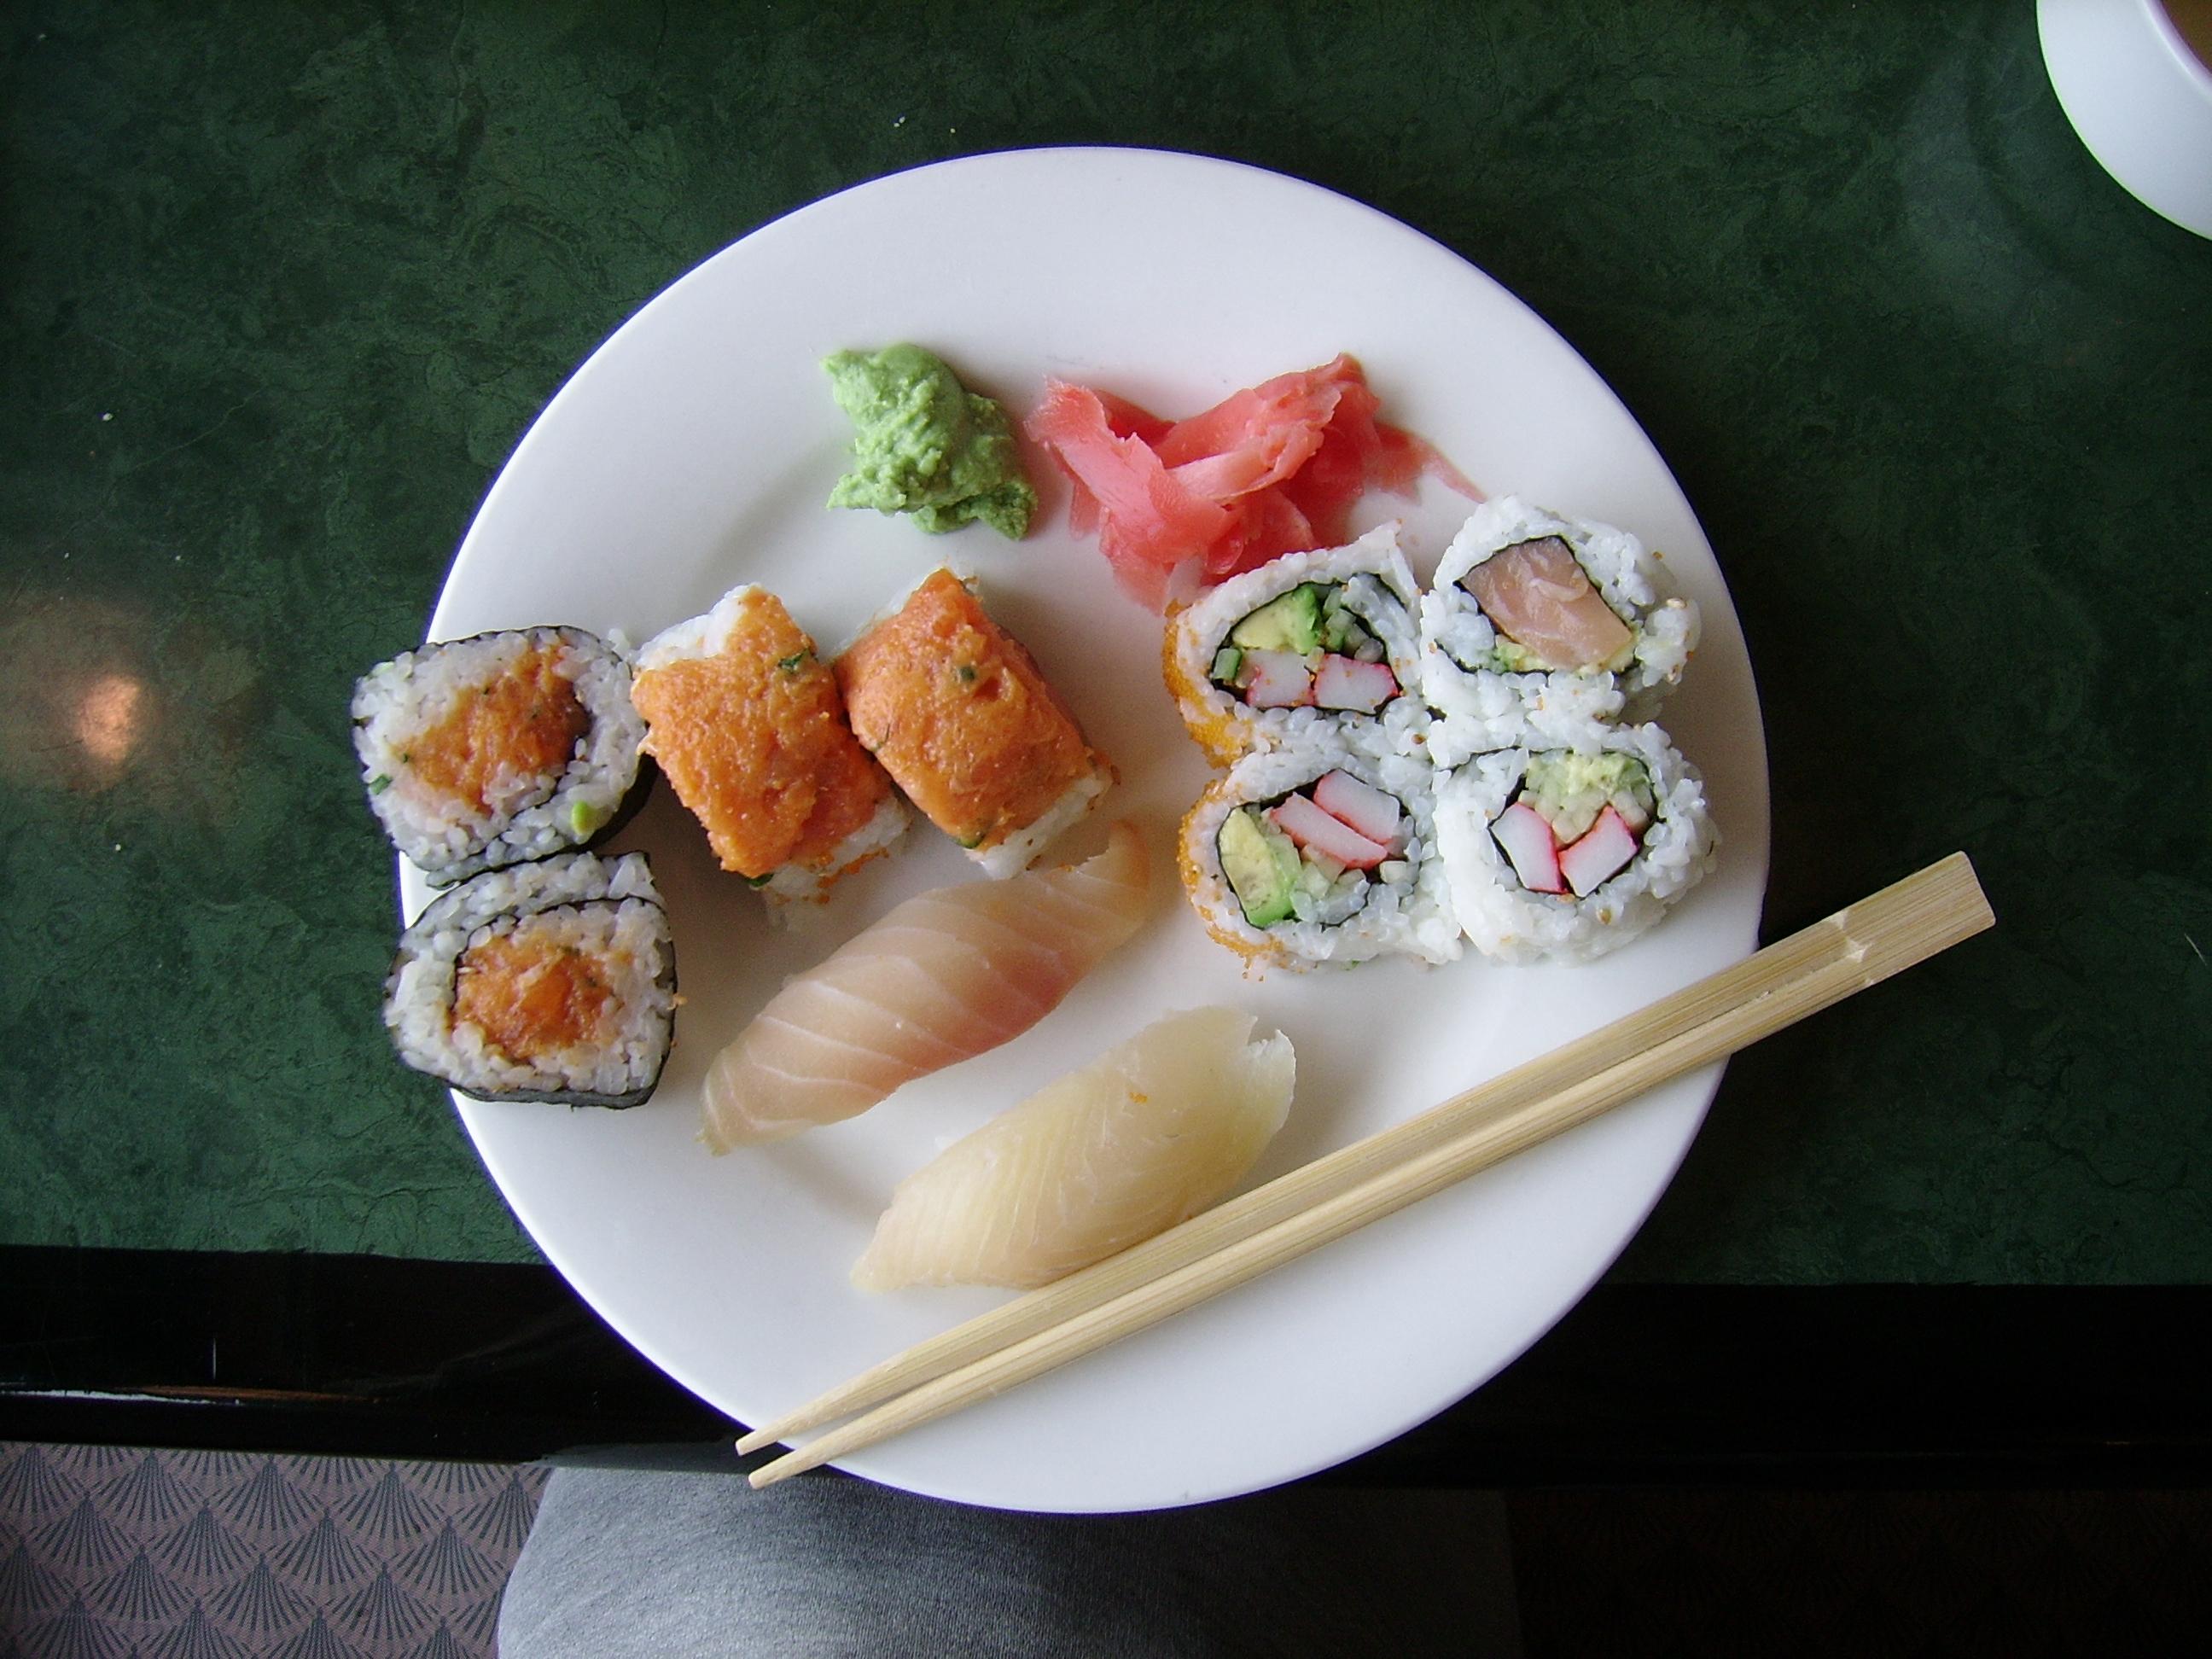 File:Plate of Sushi.jpg - Wikimedia Commons